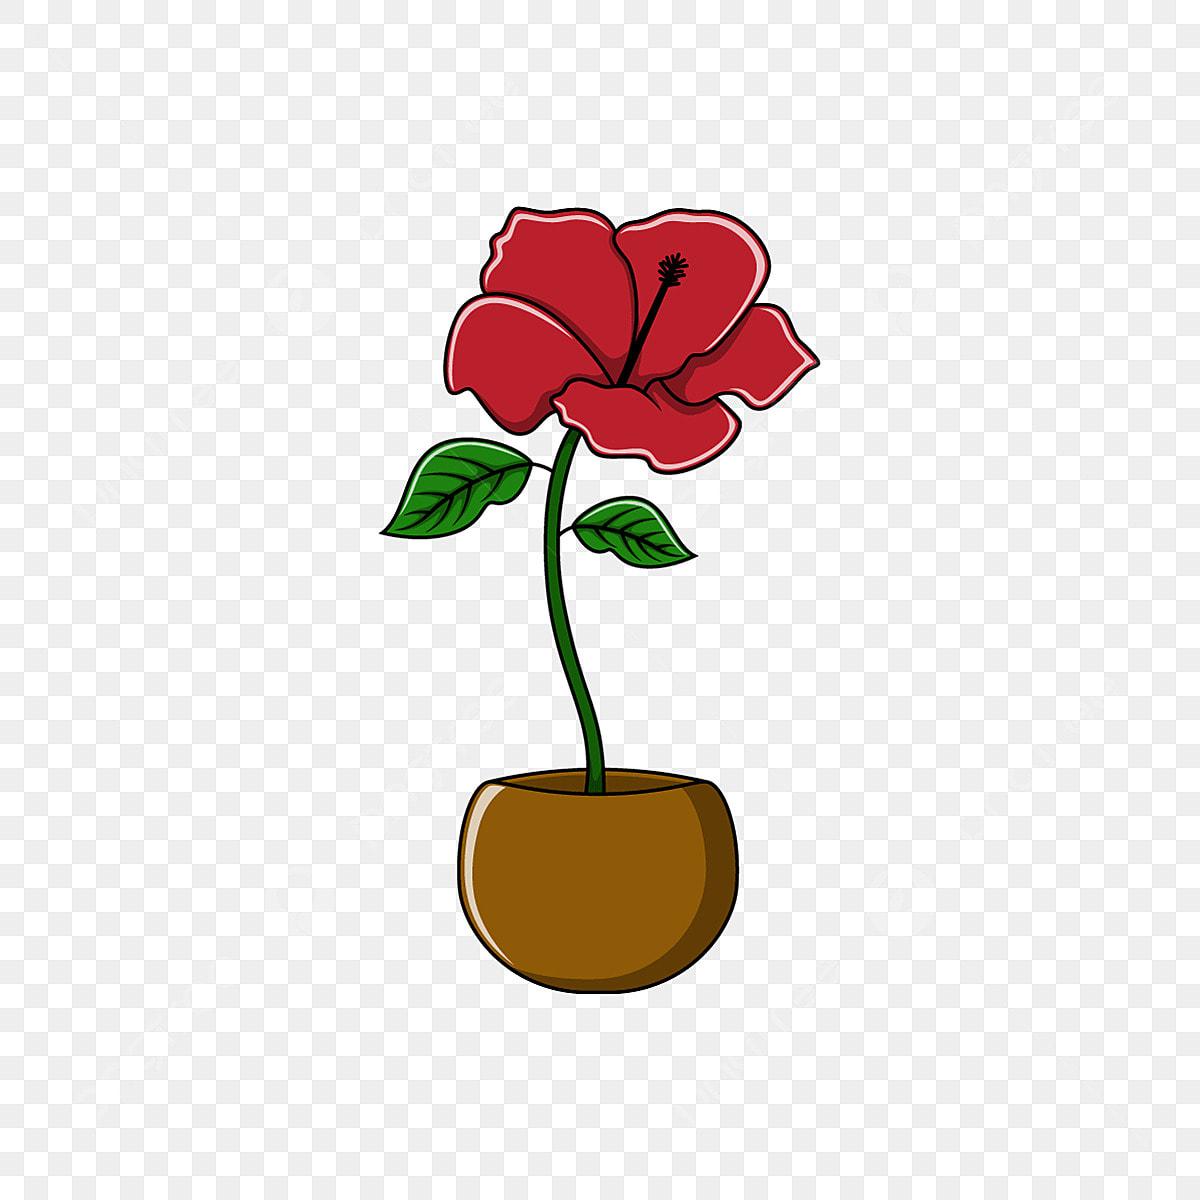 Gambar Ilustrasi Kartun Bunga Kembang Sepatu Kembang Sepatu Floral Kartun Png Dan Vektor Dengan Latar Belakang Transparan Untuk Unduh Gratis